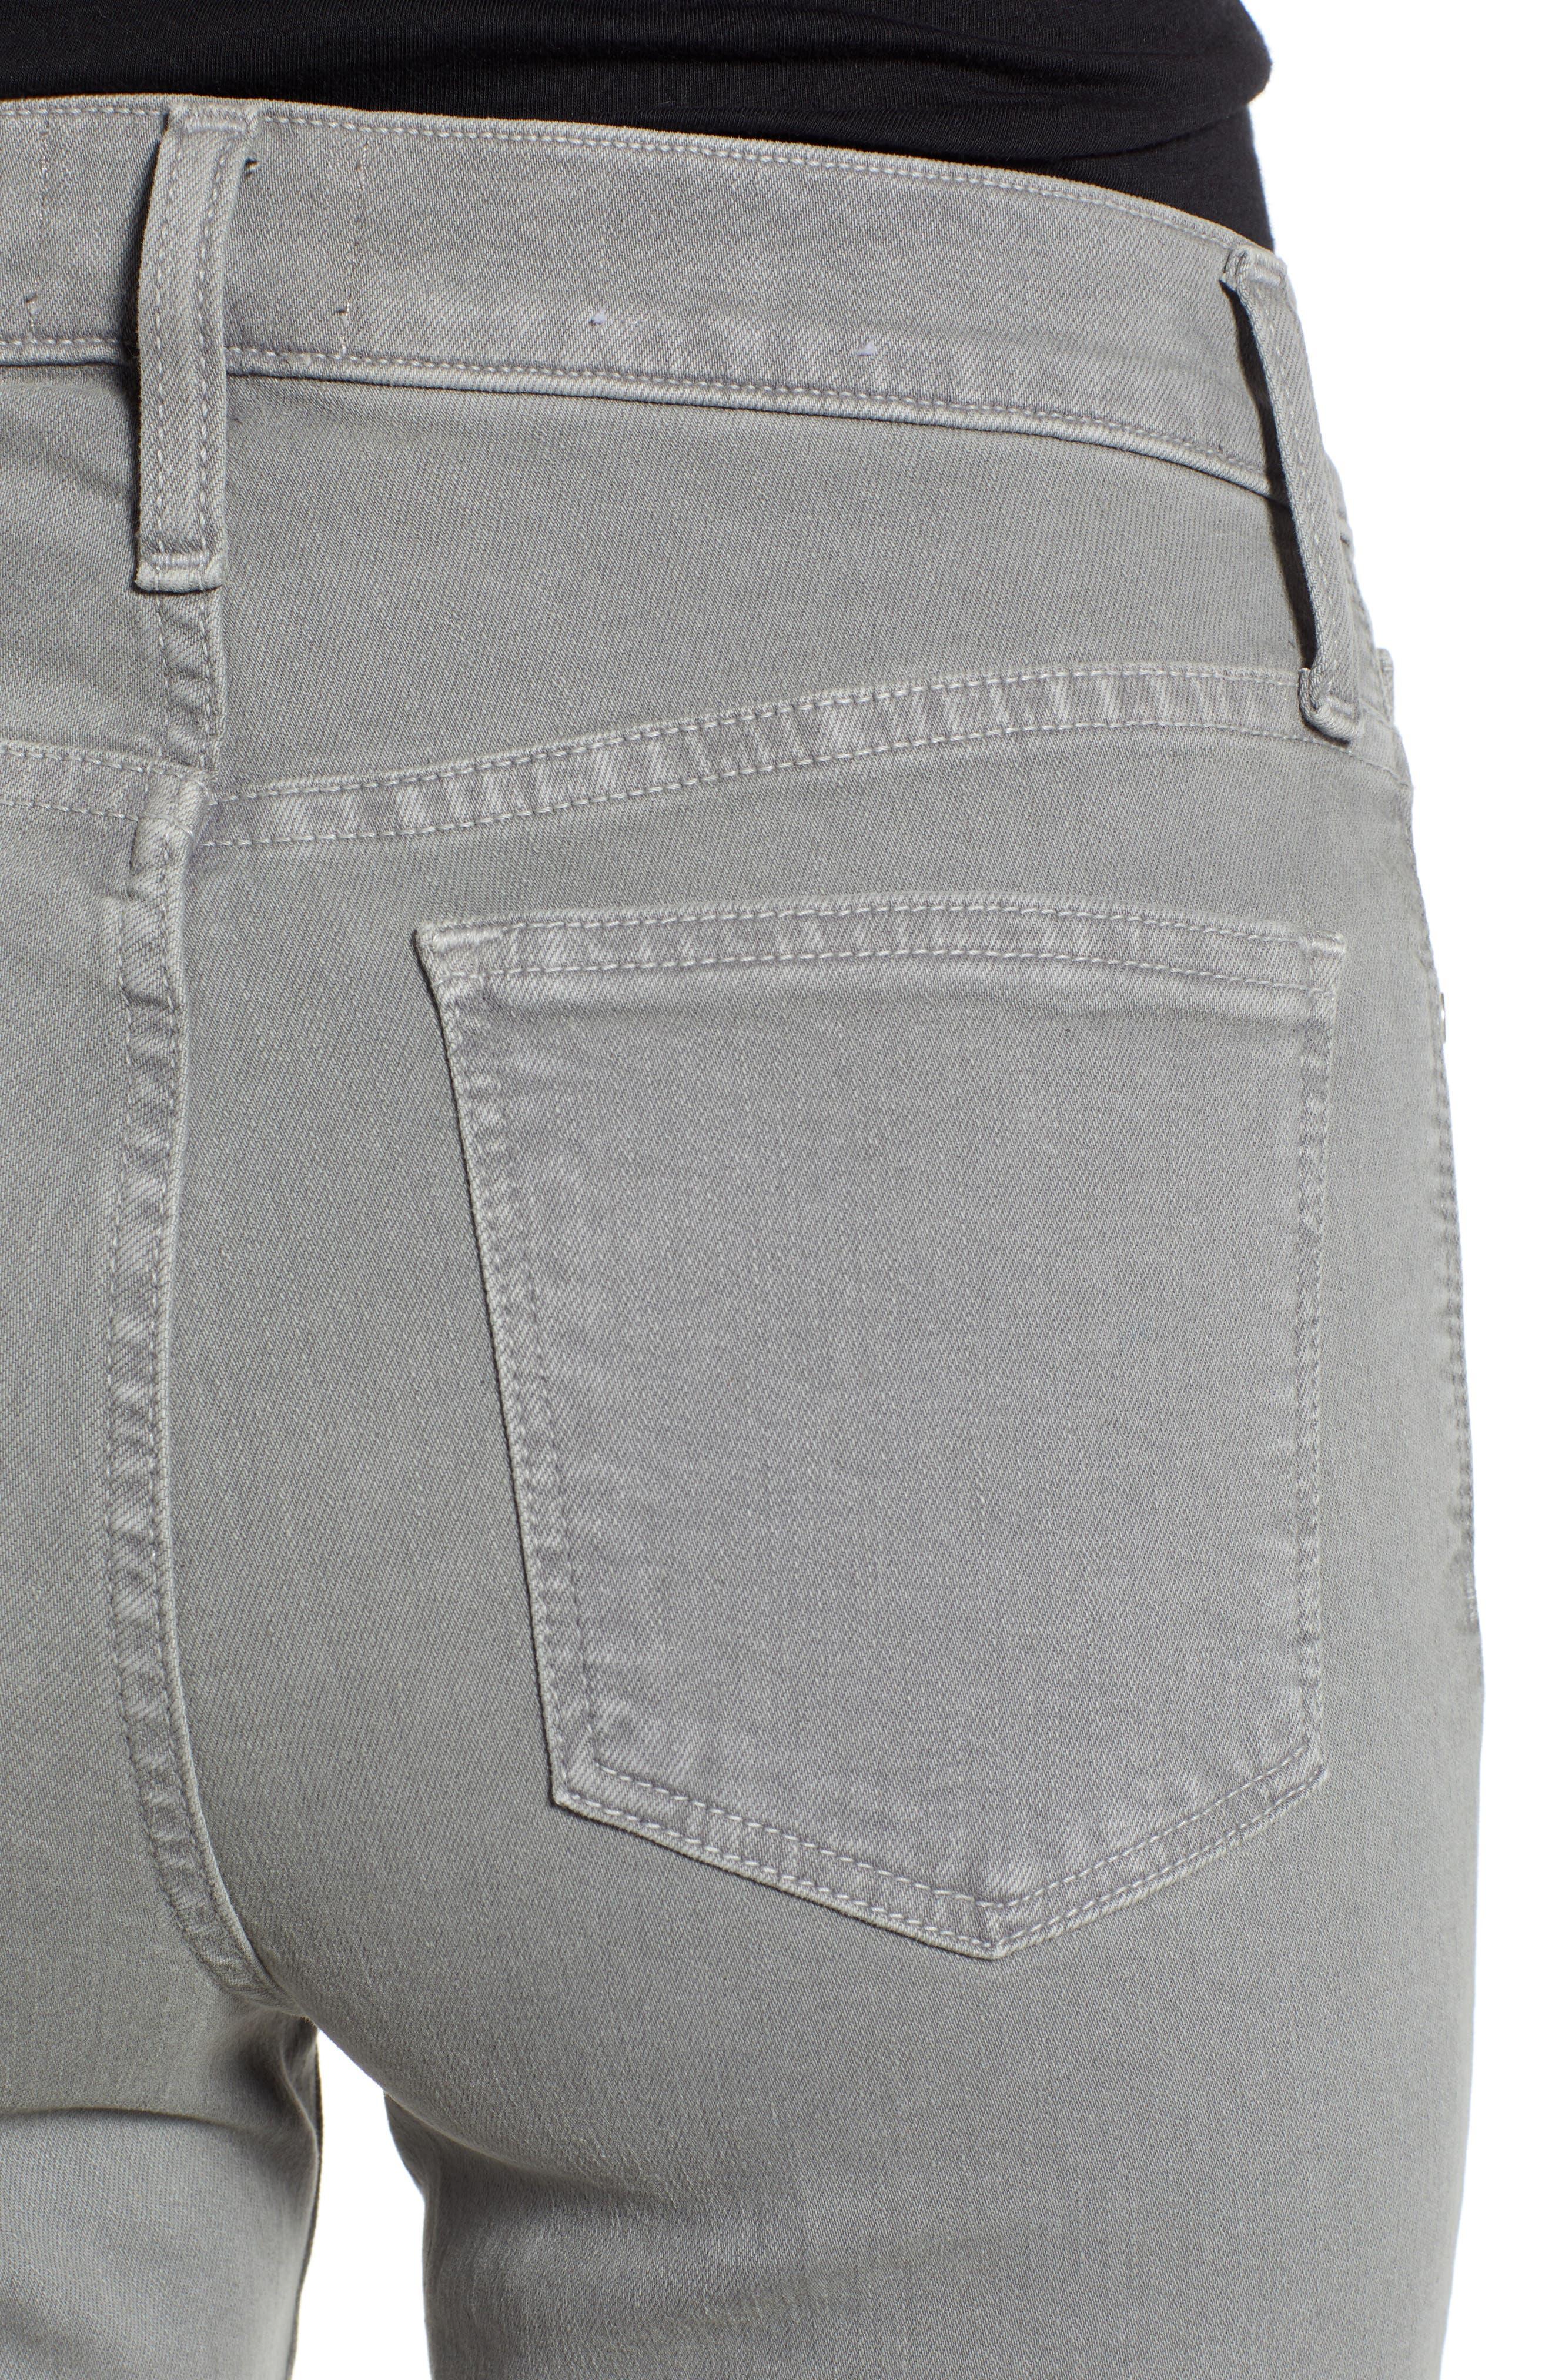 Sierra High Waist Ankle Skinny Pants,                             Alternate thumbnail 4, color,                             GREY